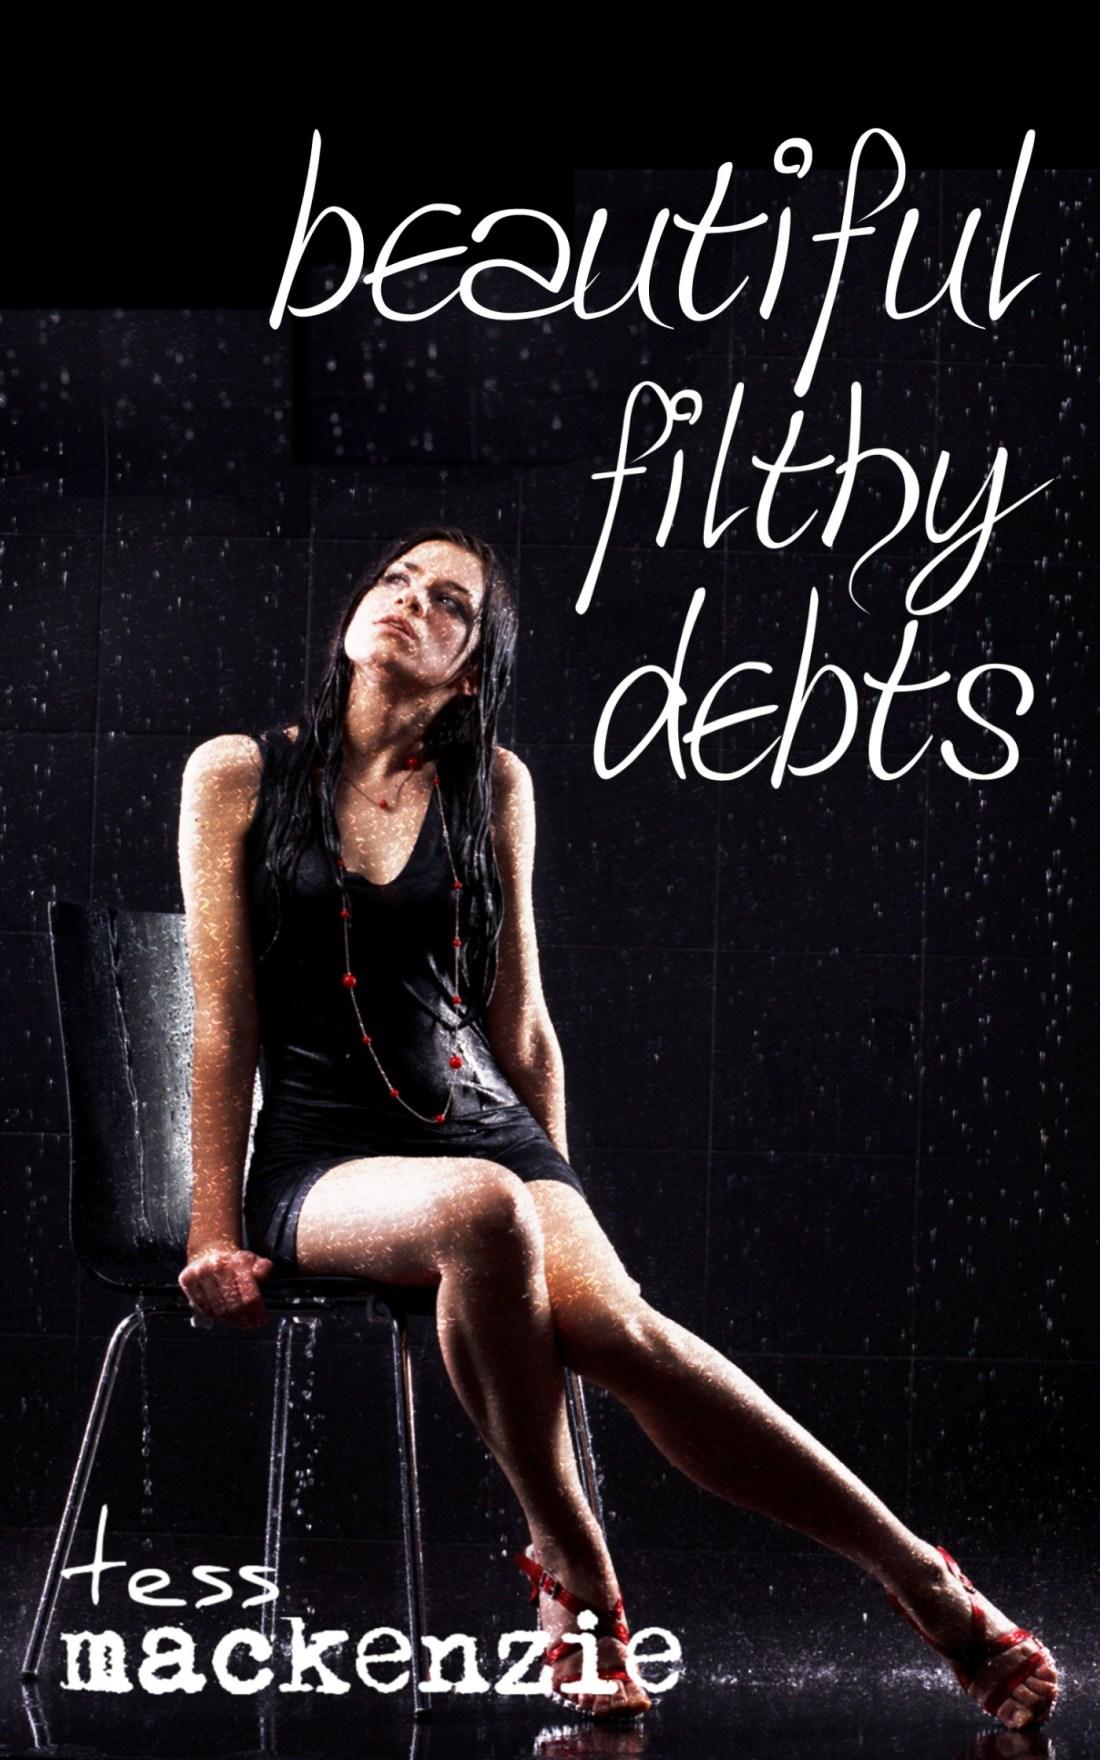 [Beautiful Filthy Debts]